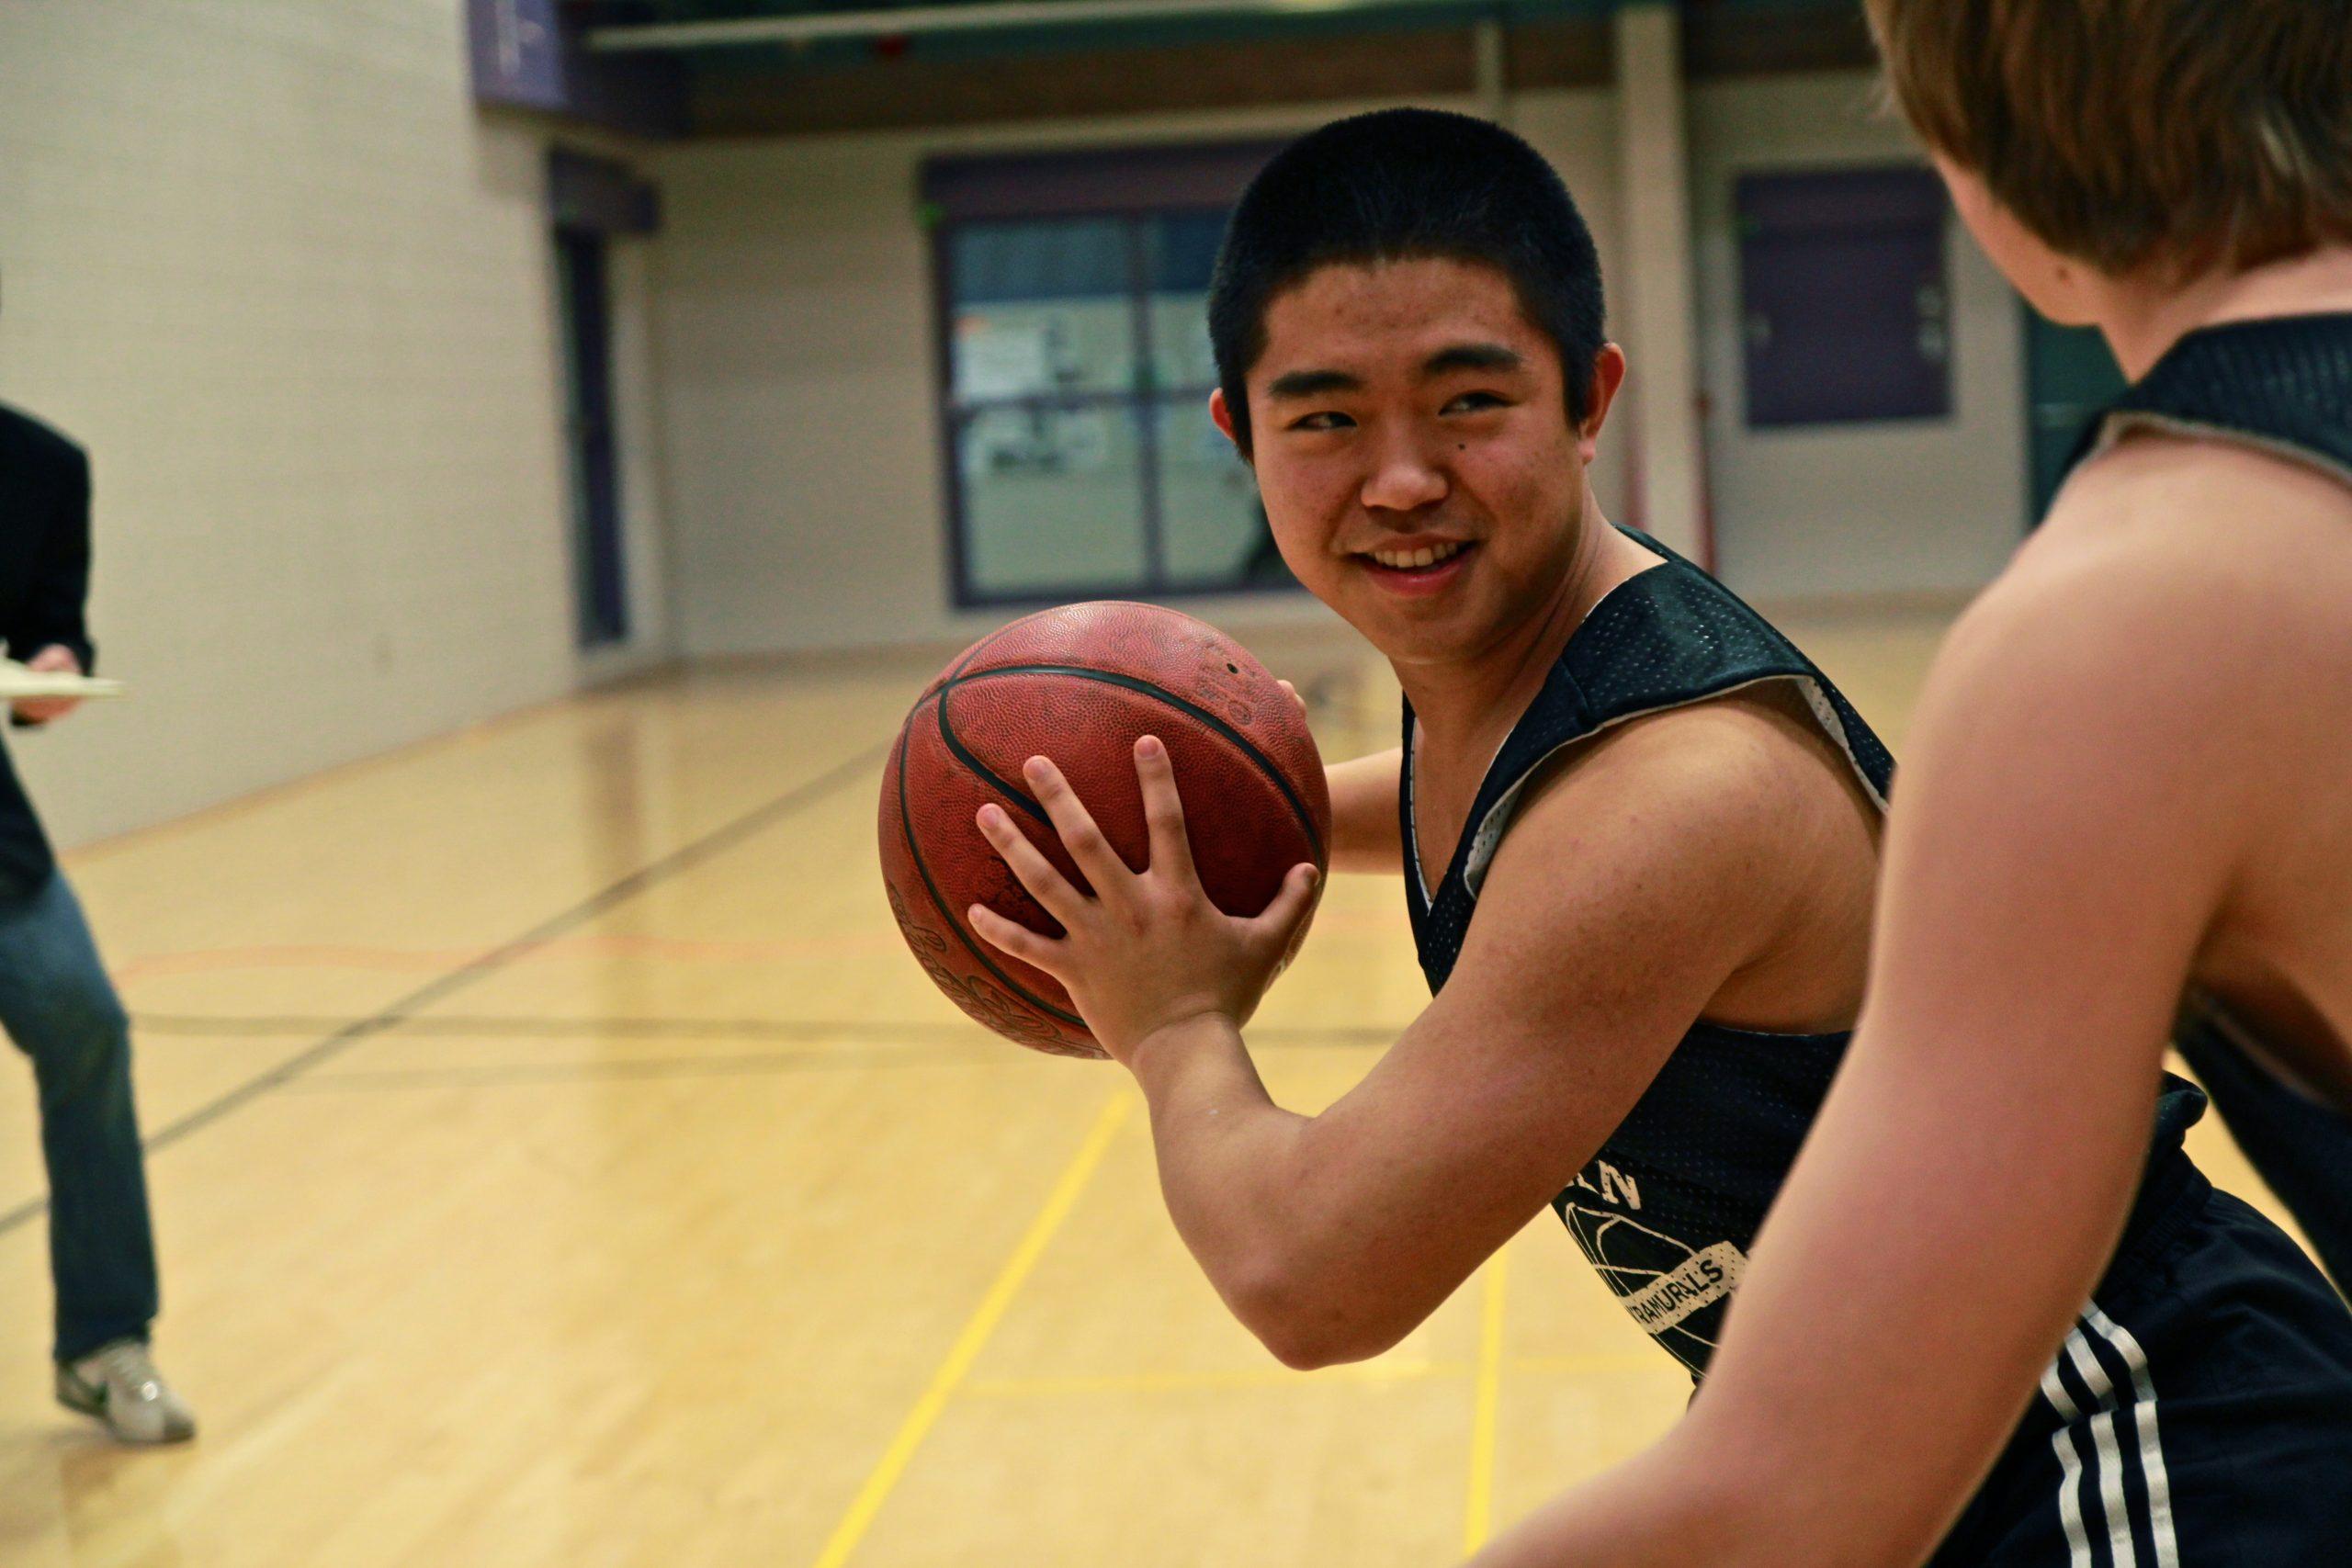 Minah Kim playing basketball